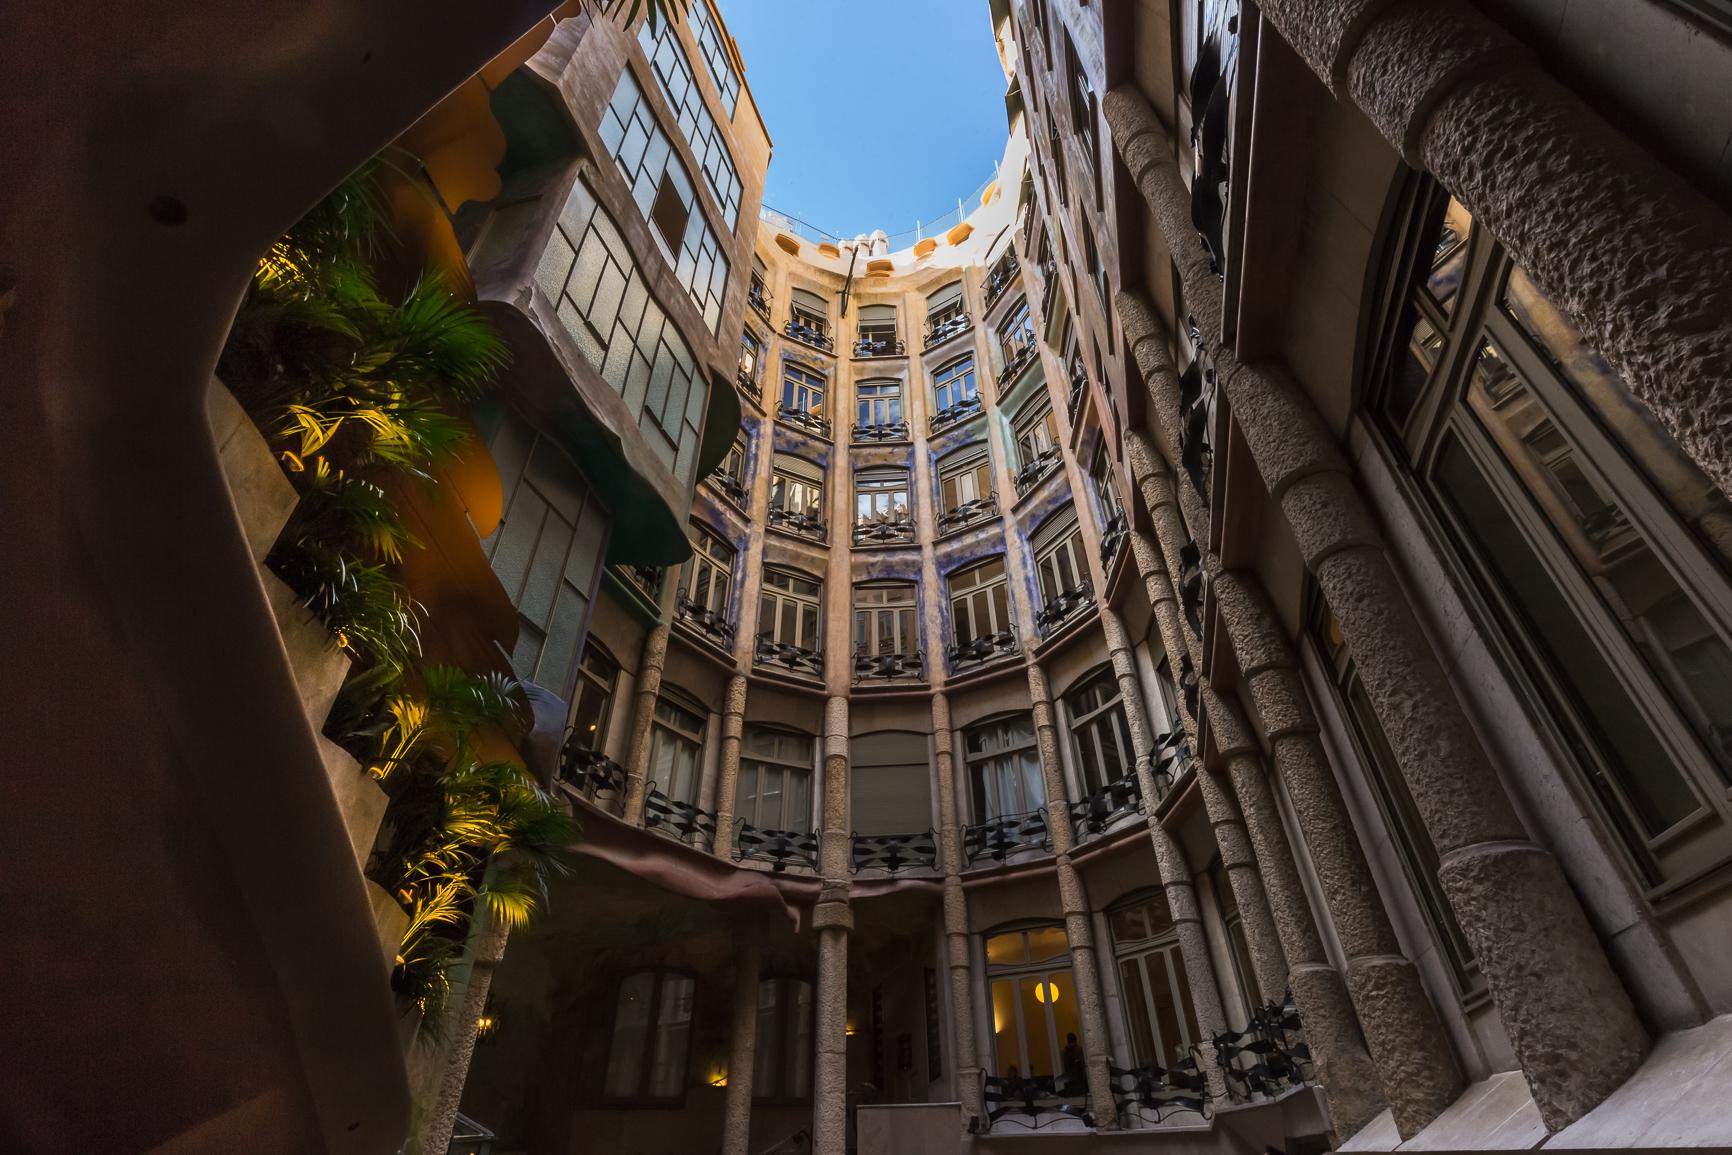 Casa Milà – Travel Monkey